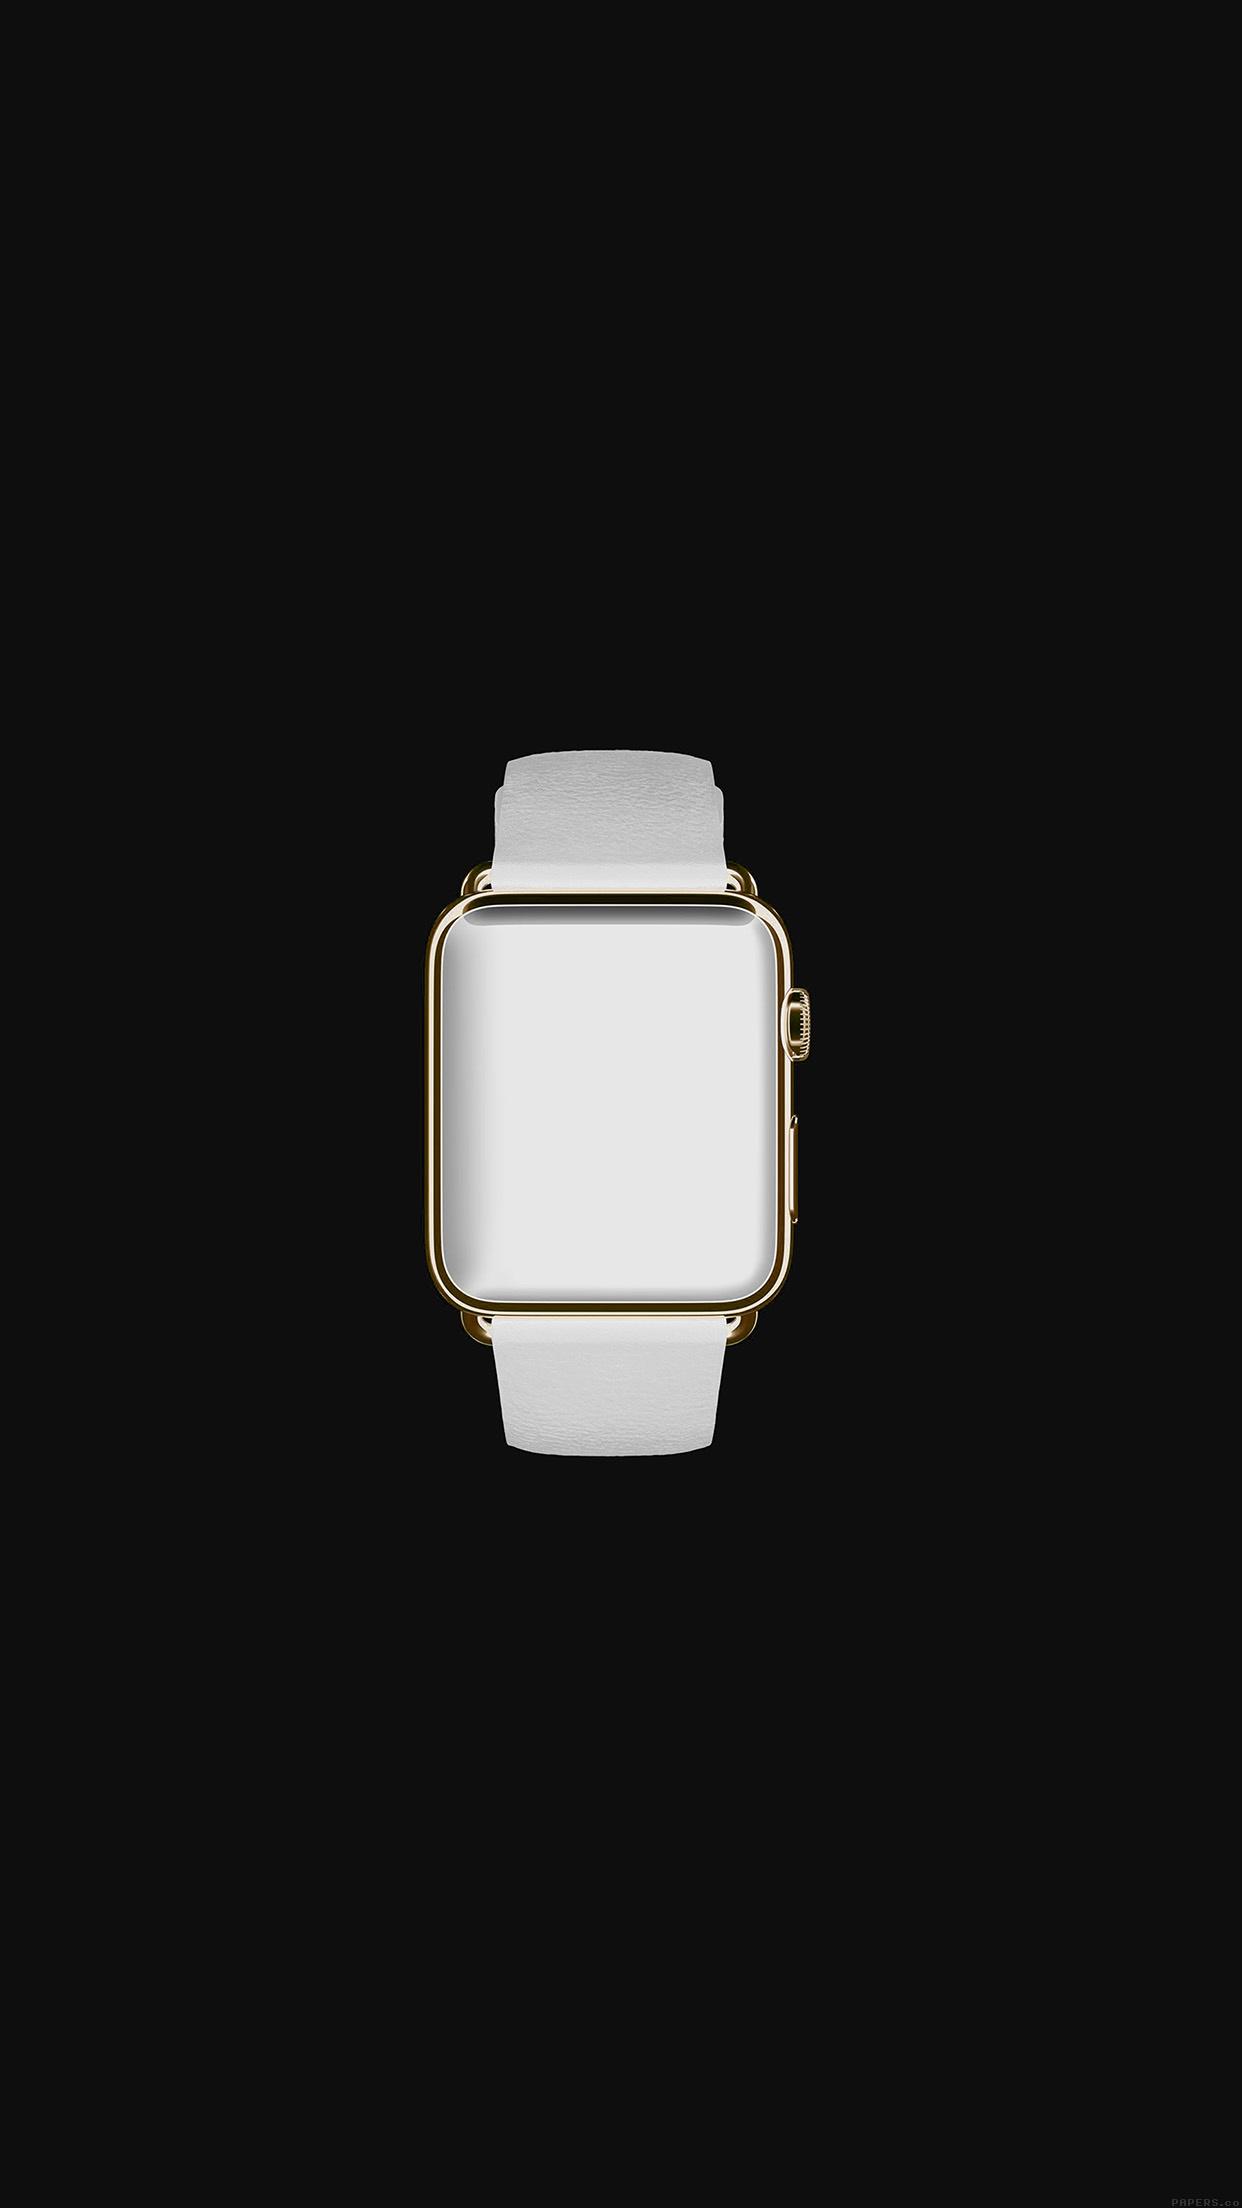 Unduh 2000 Wallpaper Apple Watch Hd  Terbaru